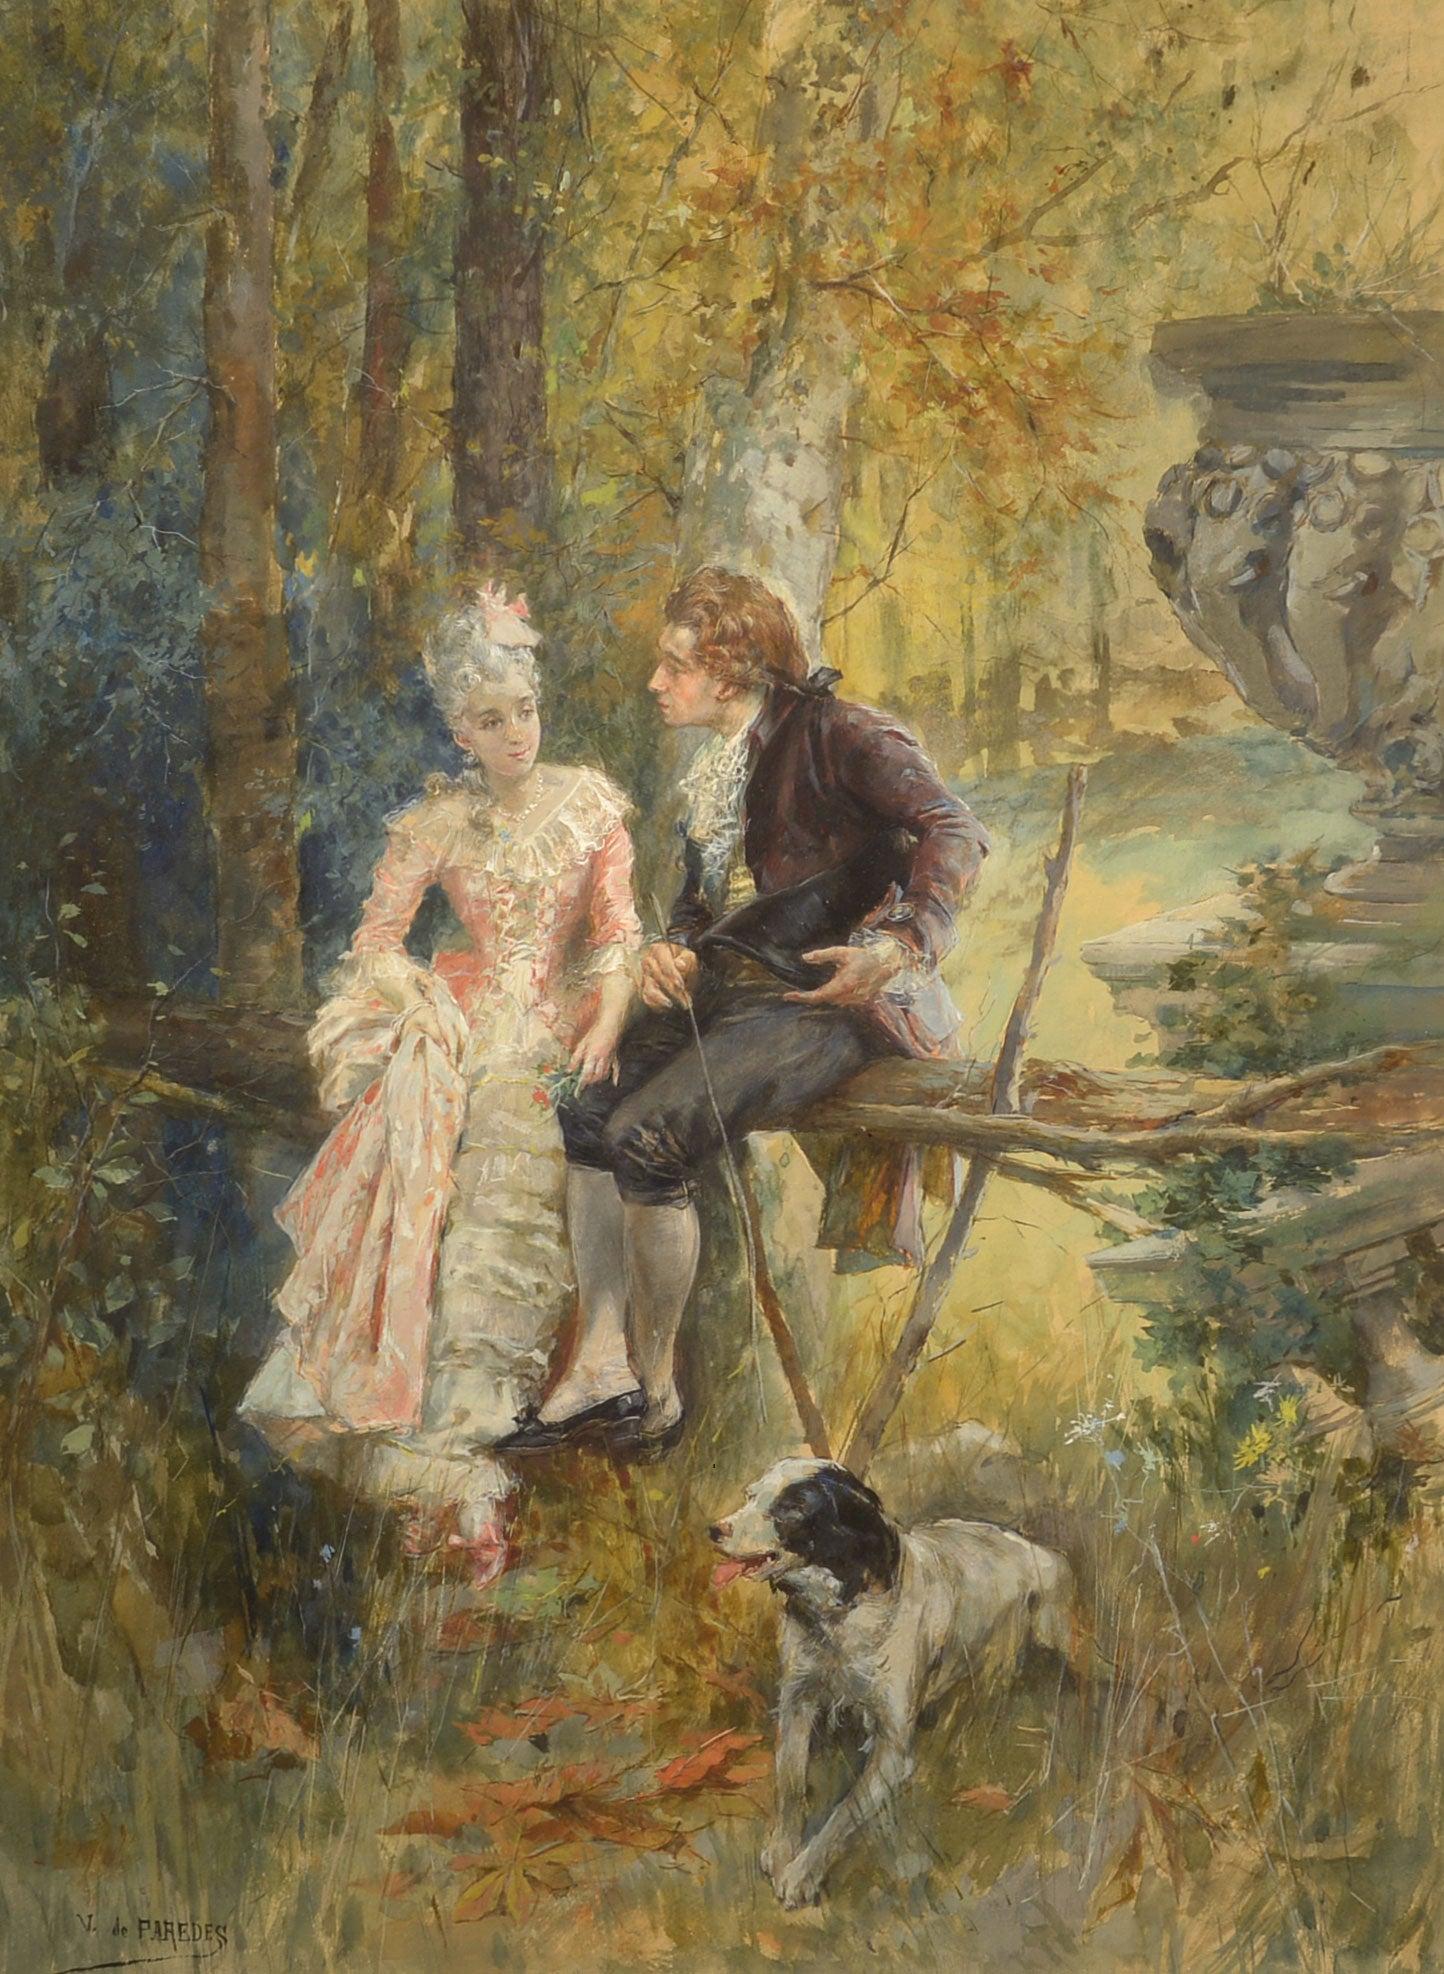 Fall Courtship